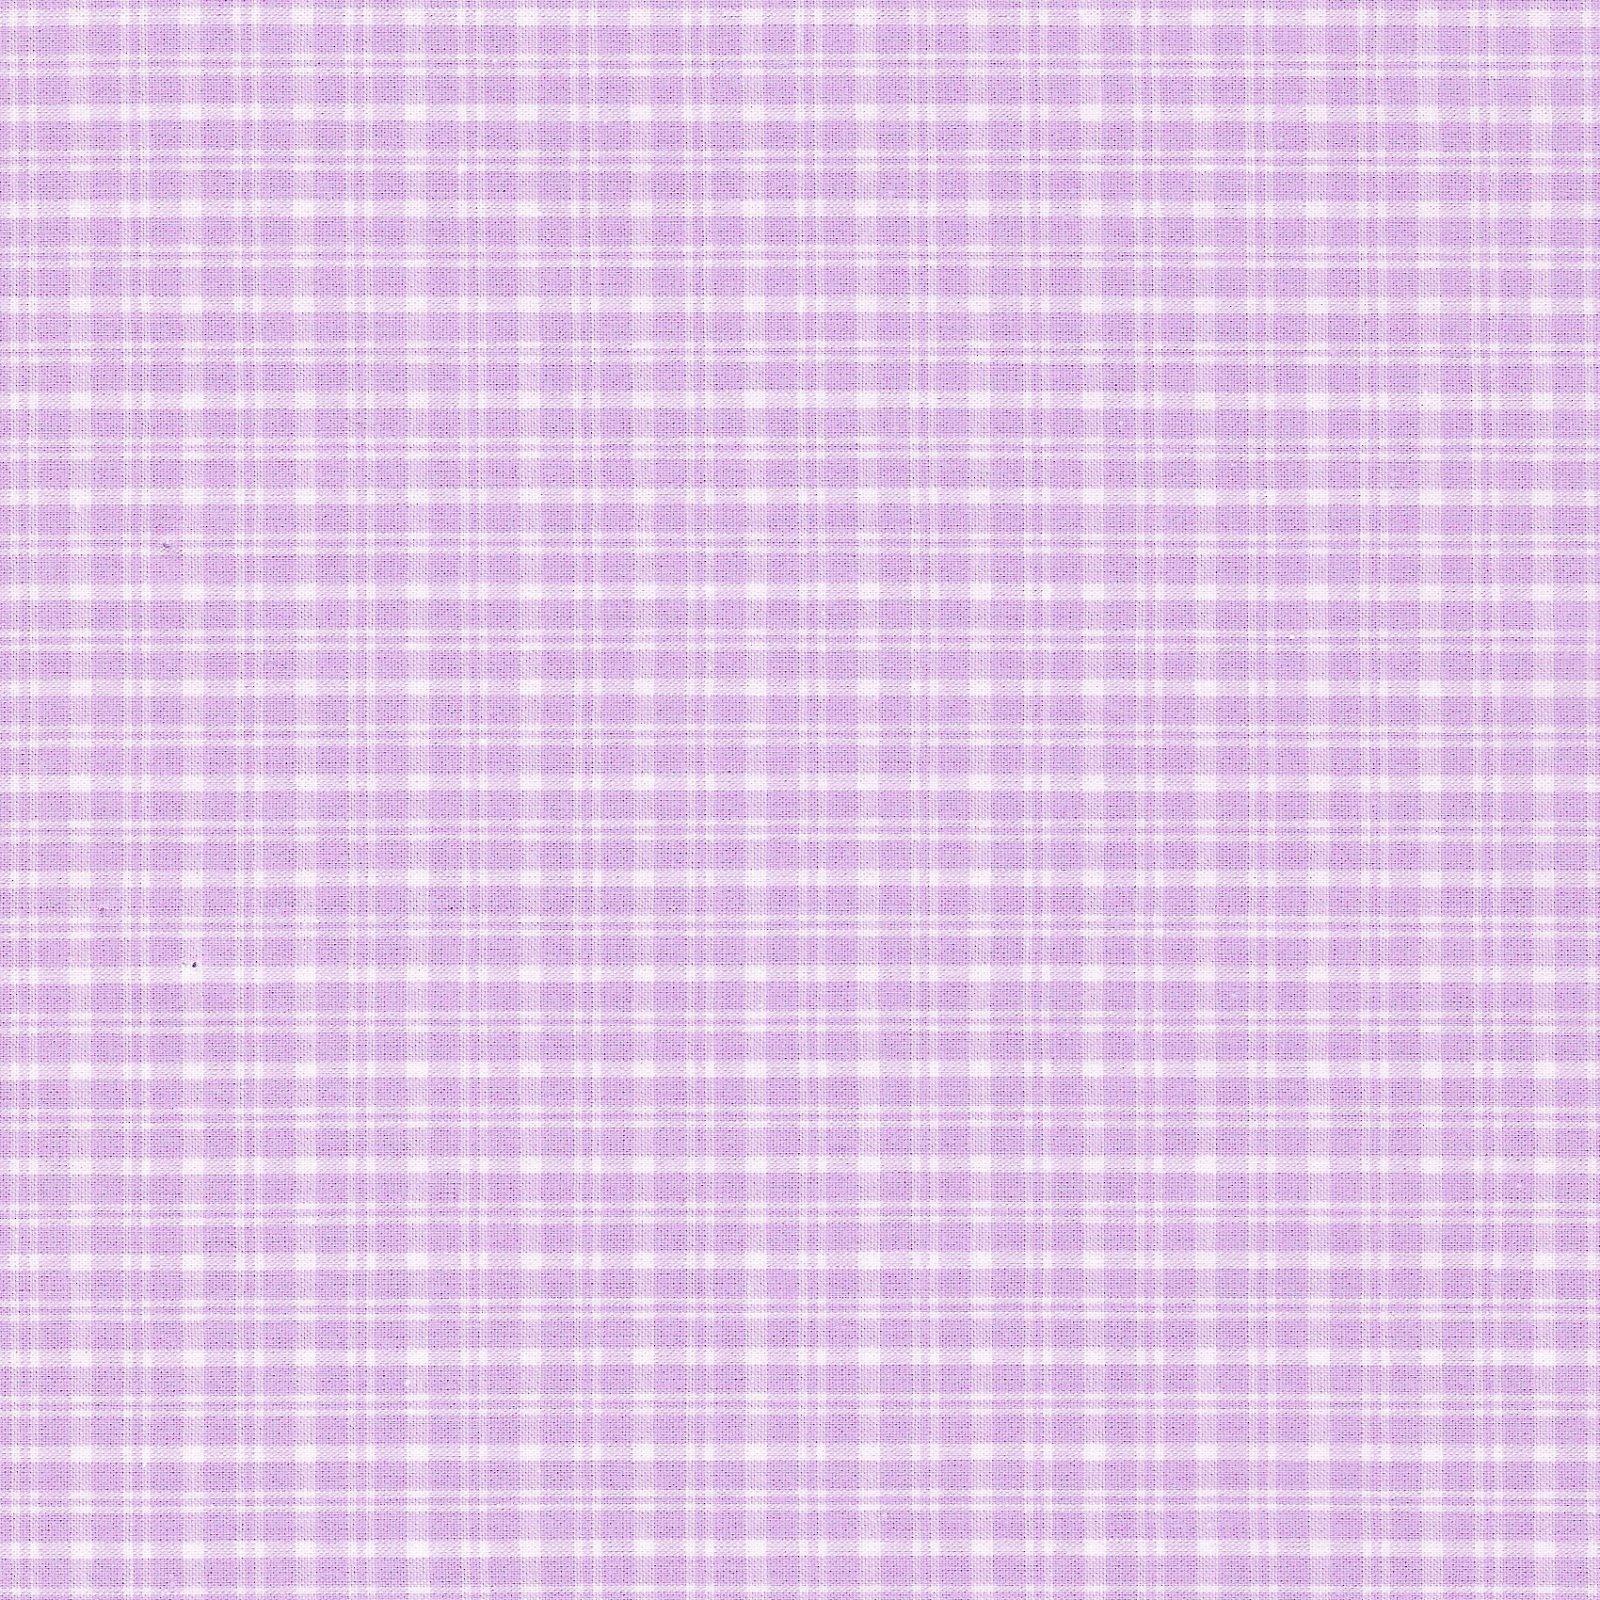 Spechler Vogel - Pastel Classics Plaid Lavender